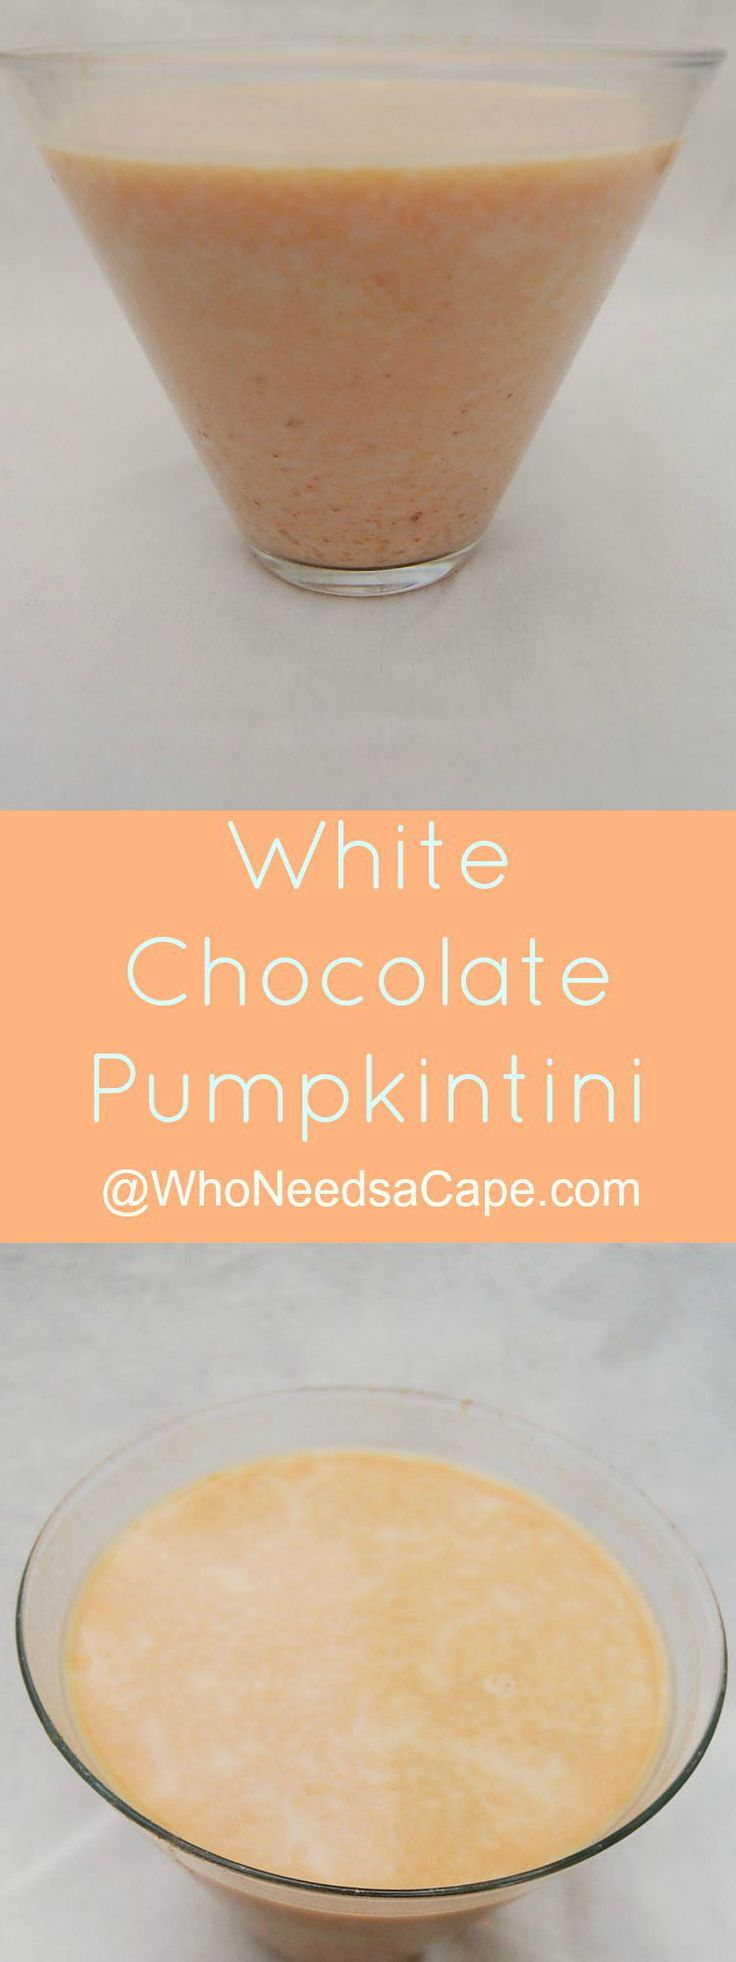 White Chocolate Pumpkintini A must drink combo of Chocolate and Pumpkin - Dessert Martini